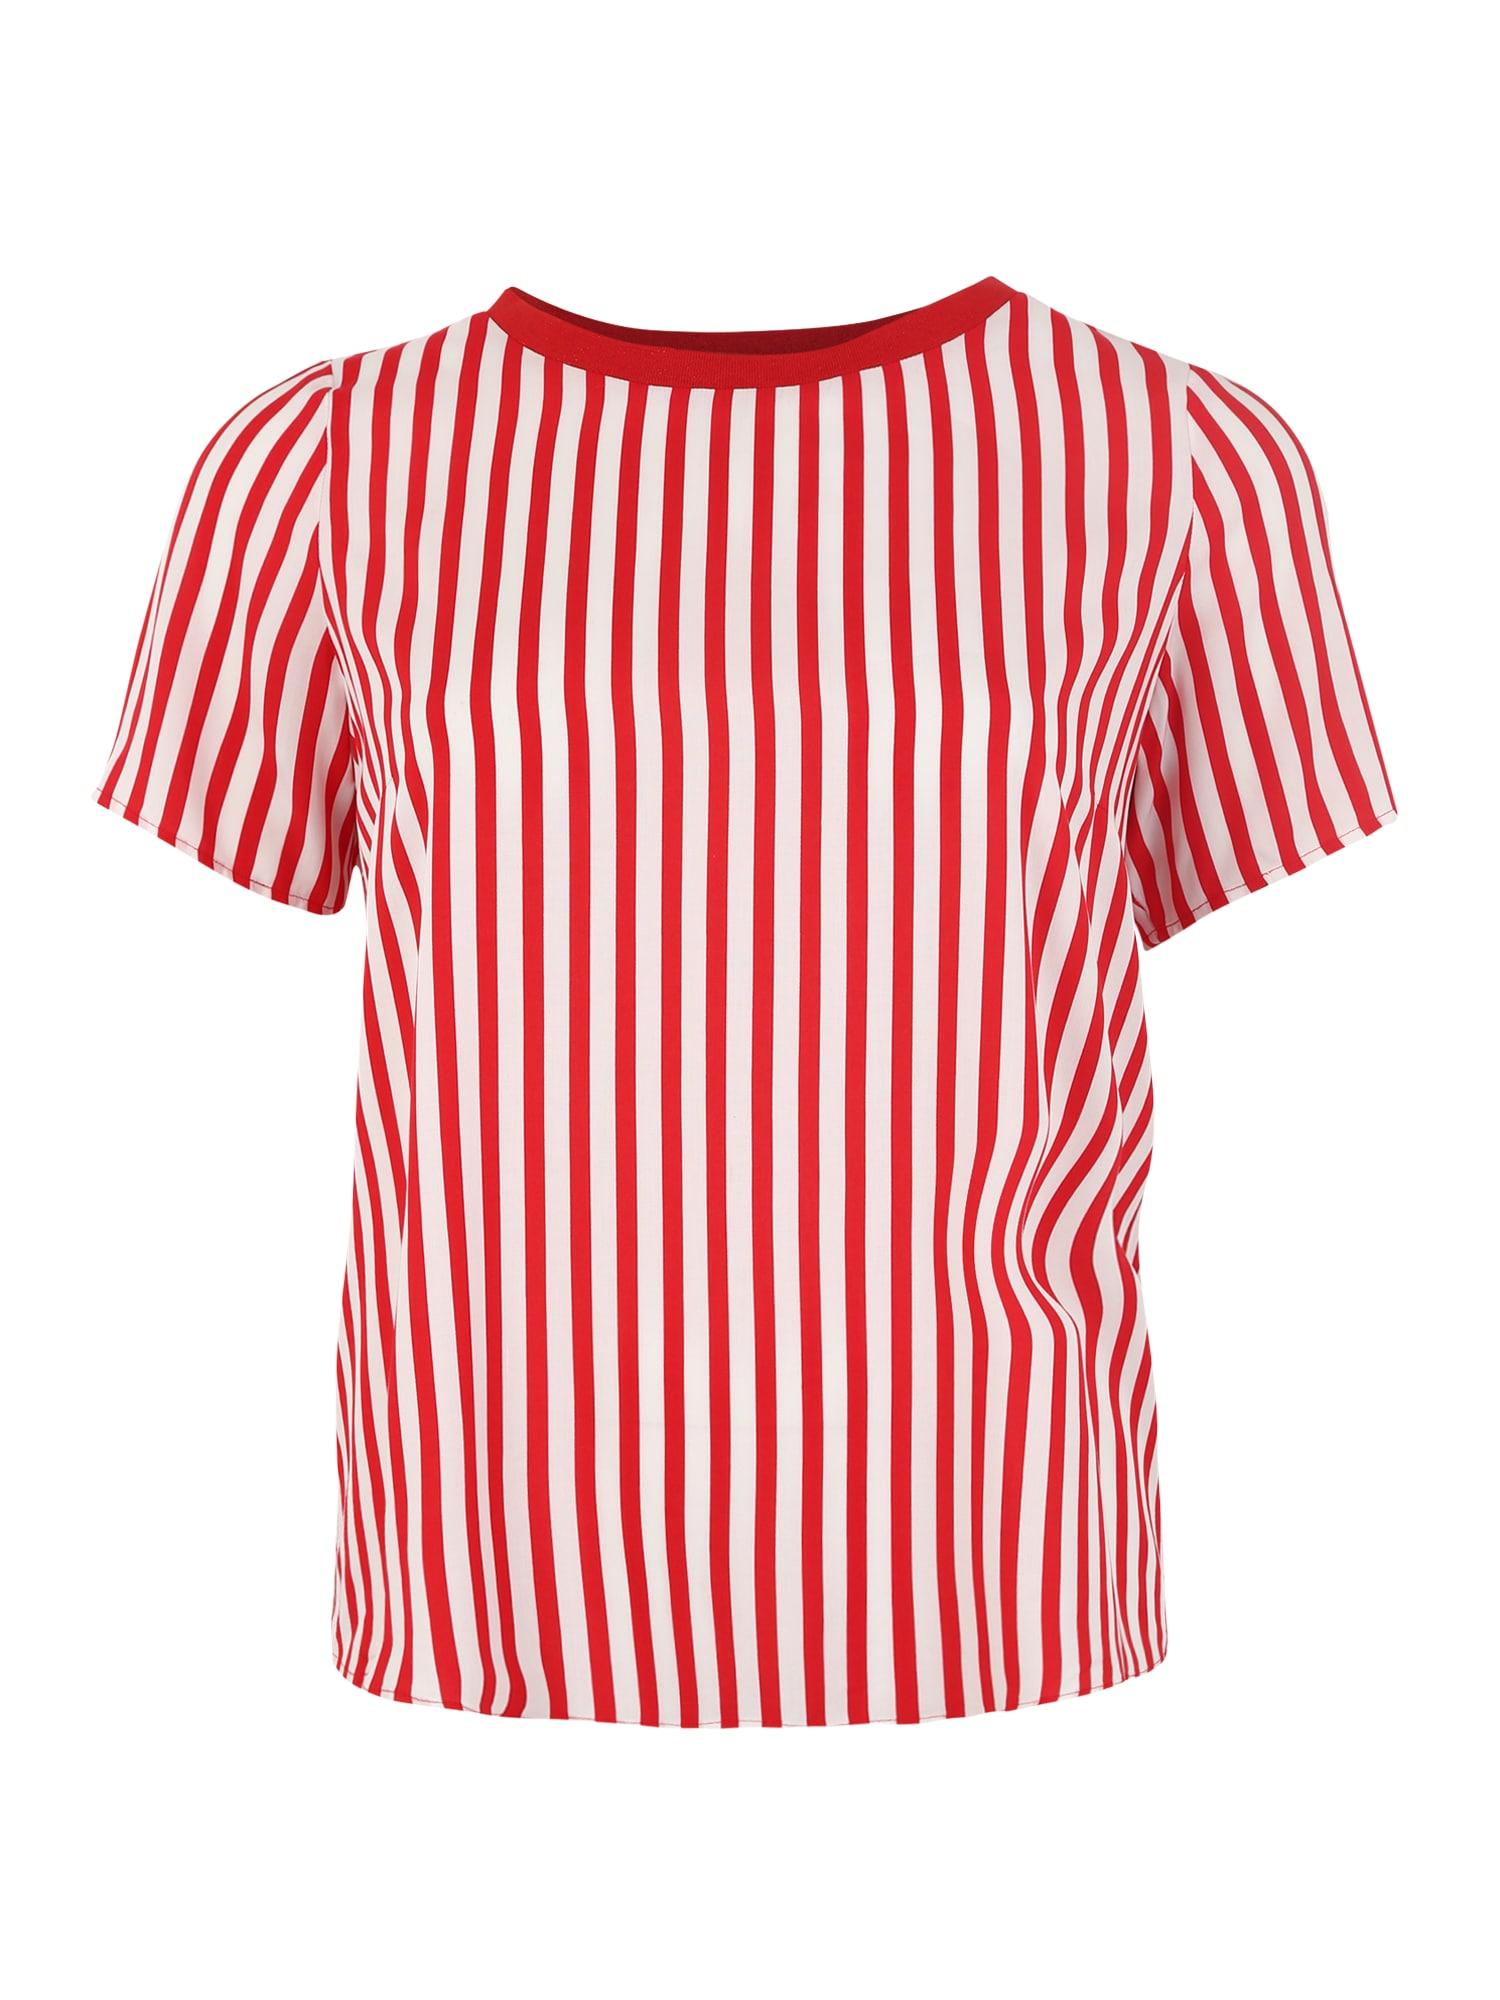 Tričko LUNA červená bílá ONLY Carmakoma